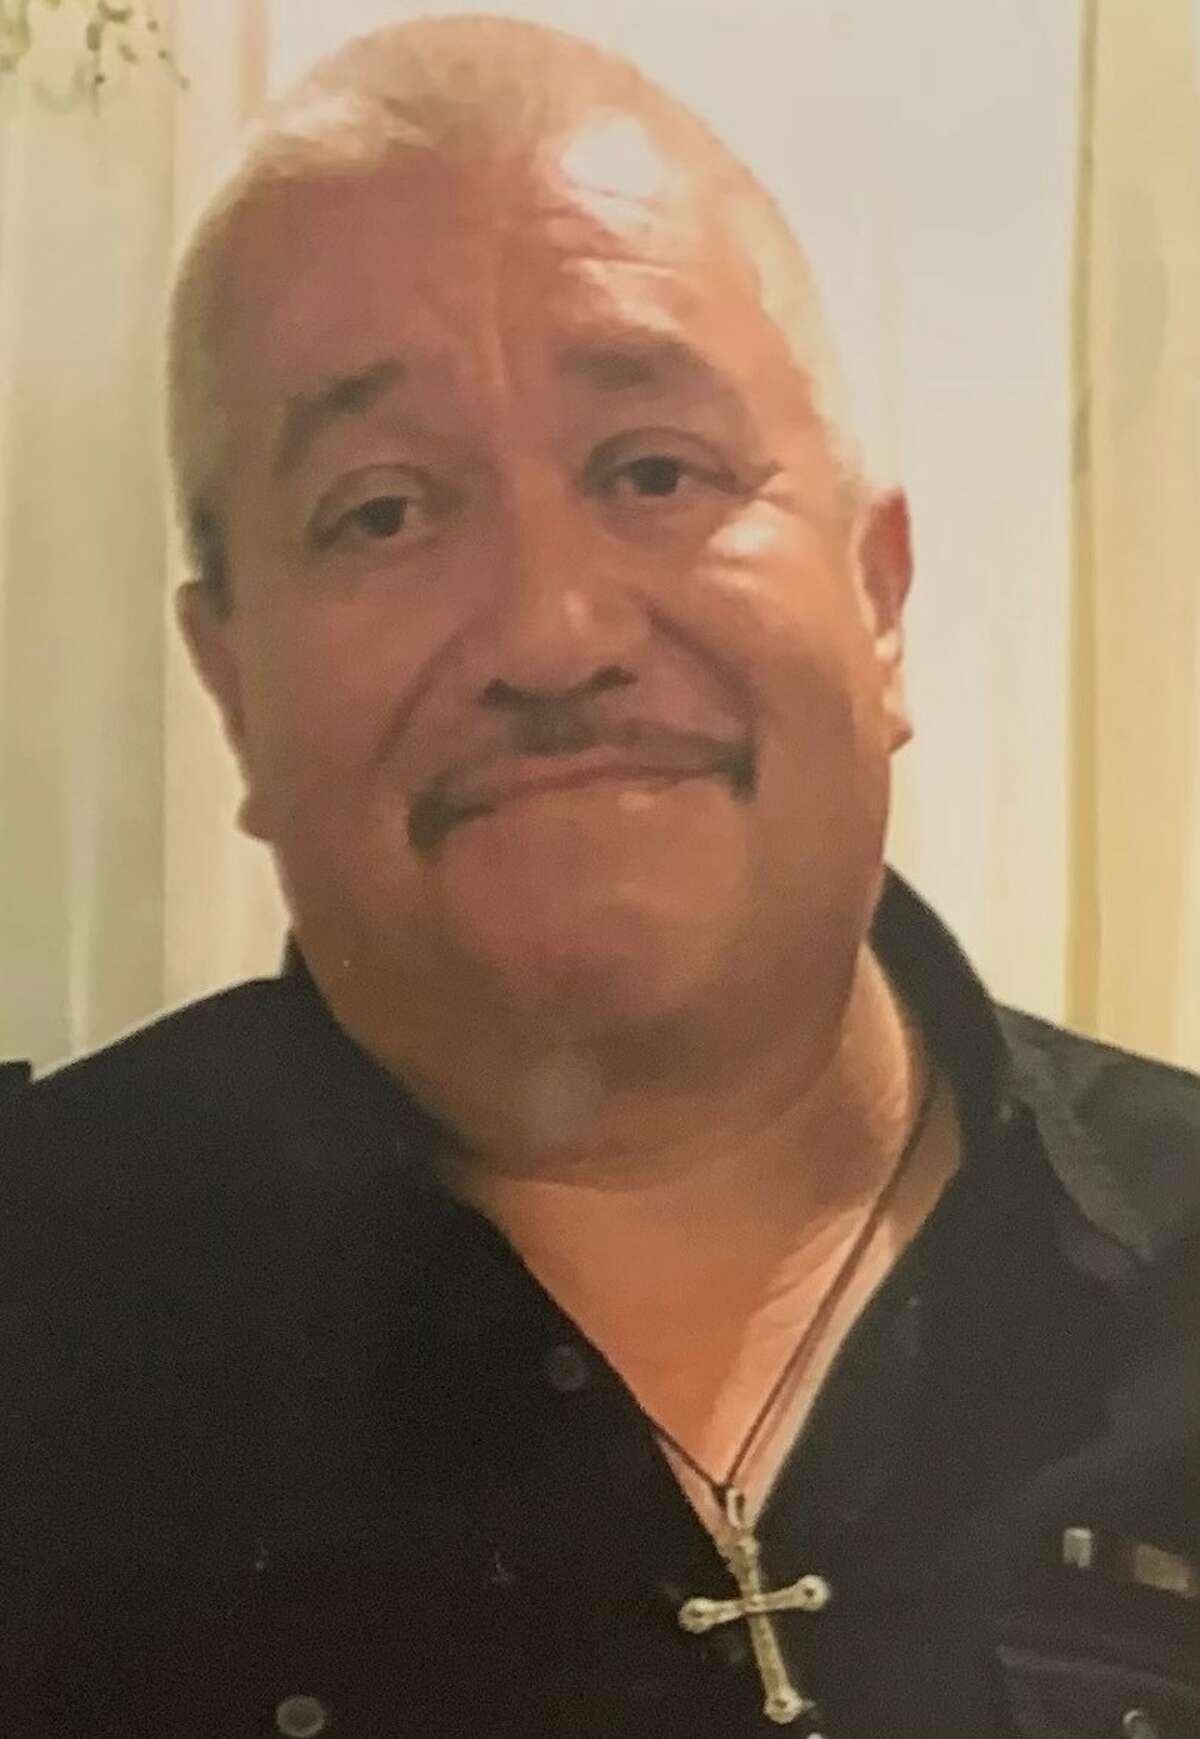 VICTOR HUGO ALVARADO